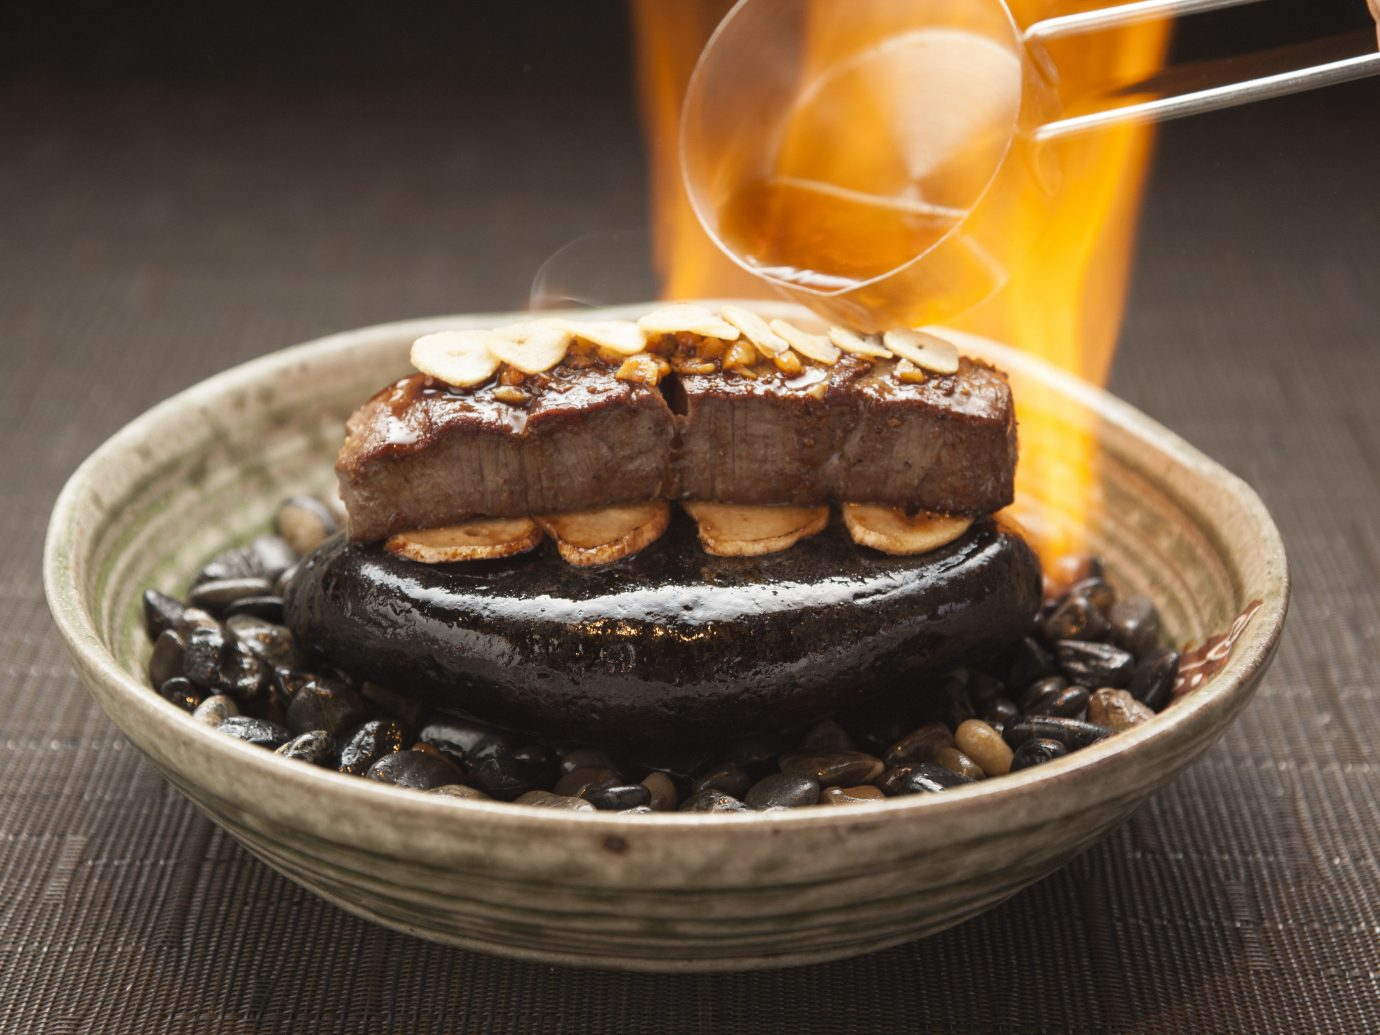 Food + Drink table food dish dessert cuisine produce snack food chocolate cake flavor